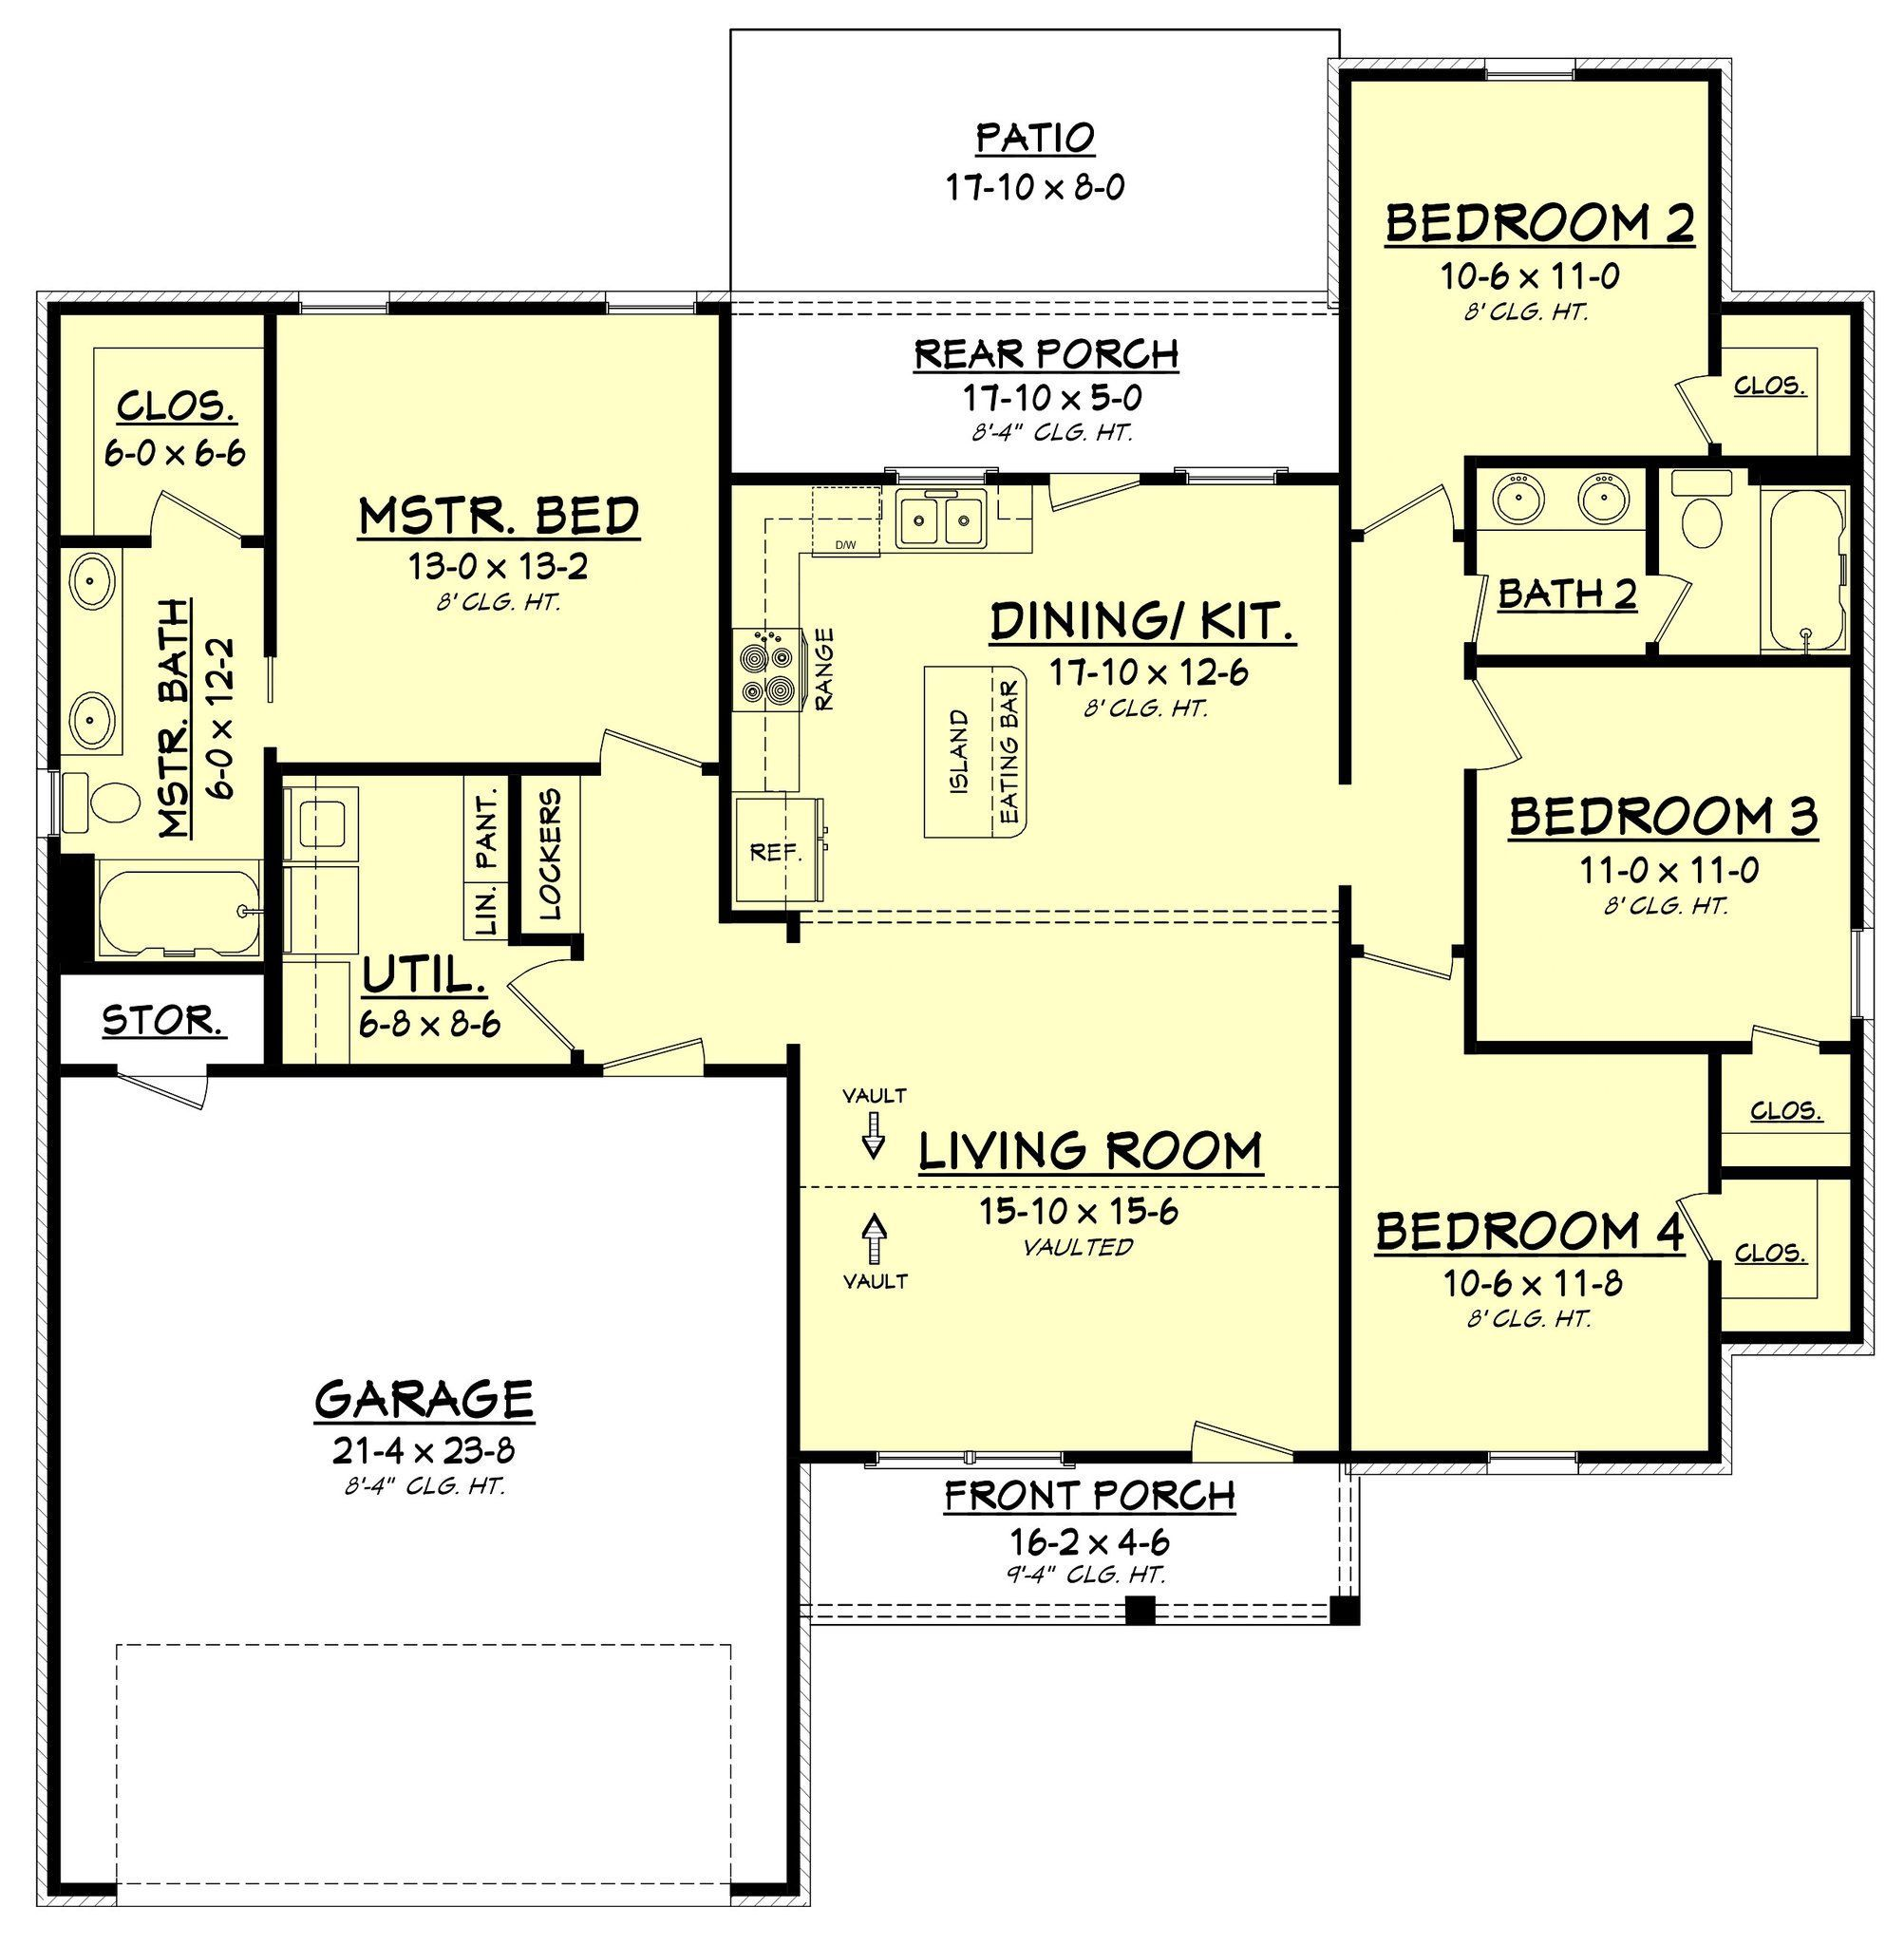 Amazing four bedroom home design under 1600 square feet ...